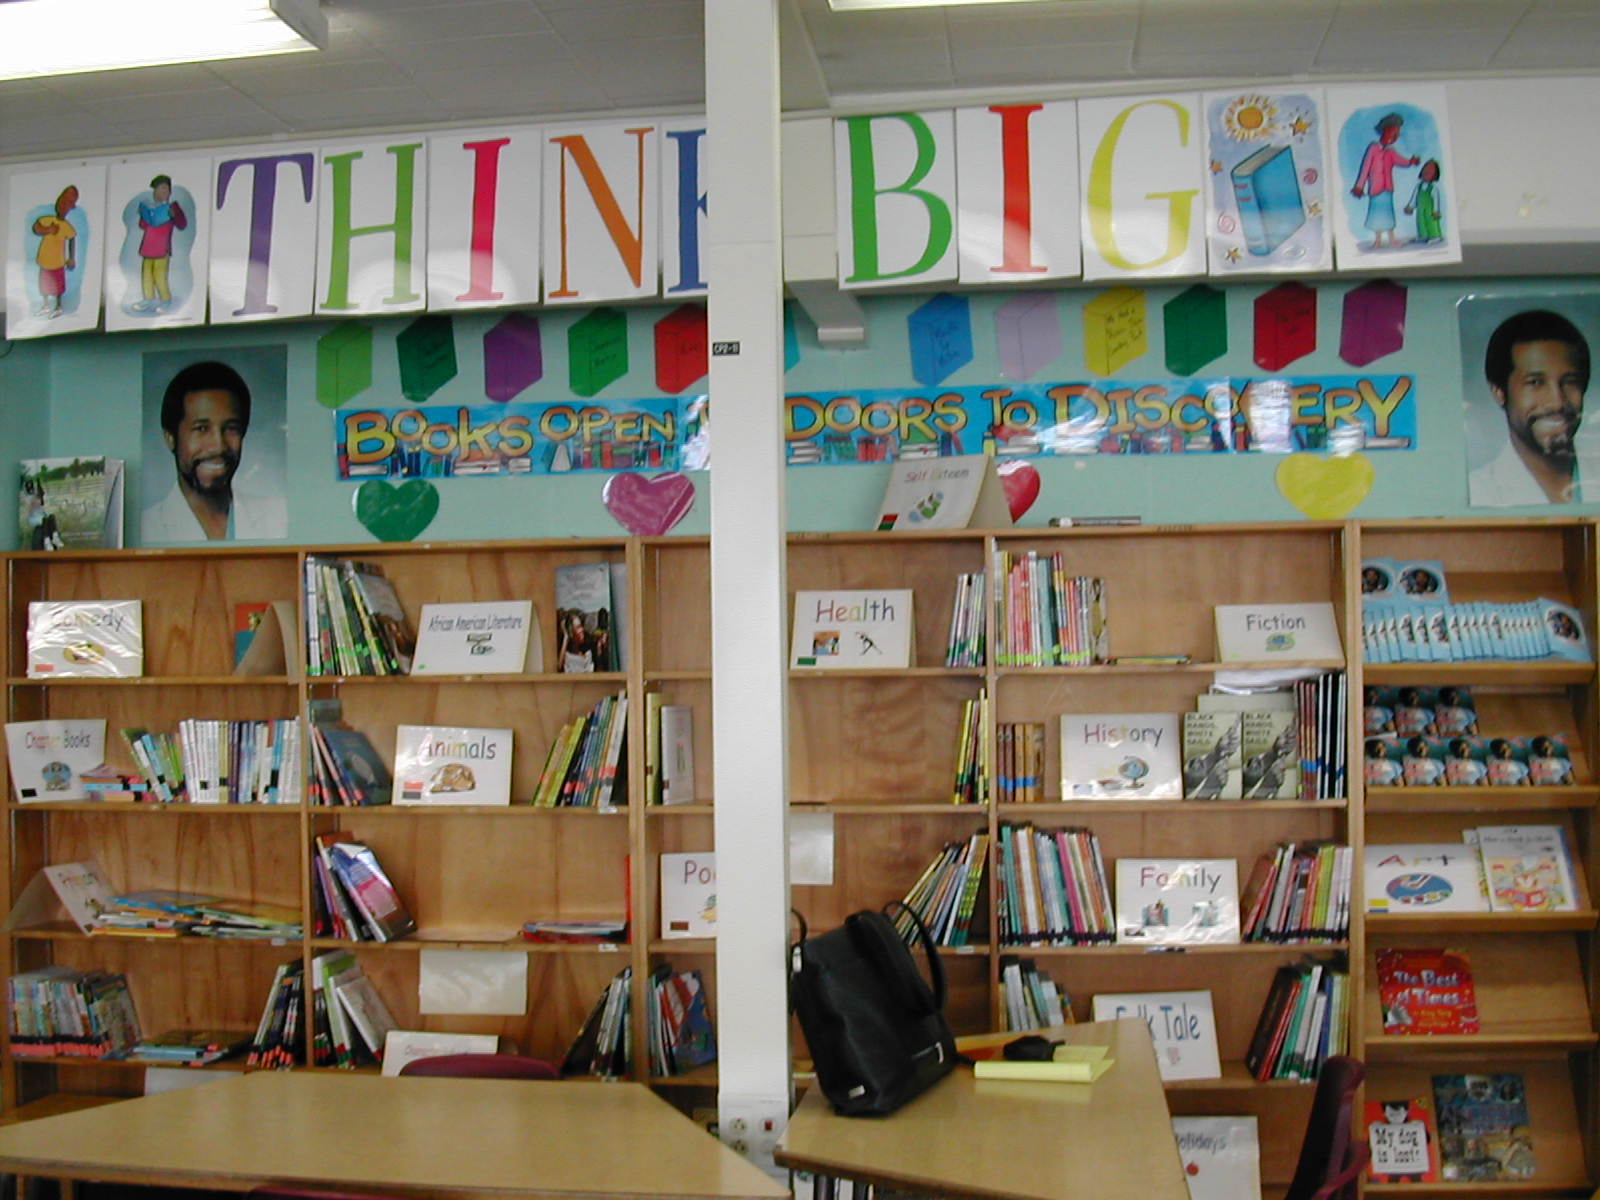 THINK BIG bookshelf